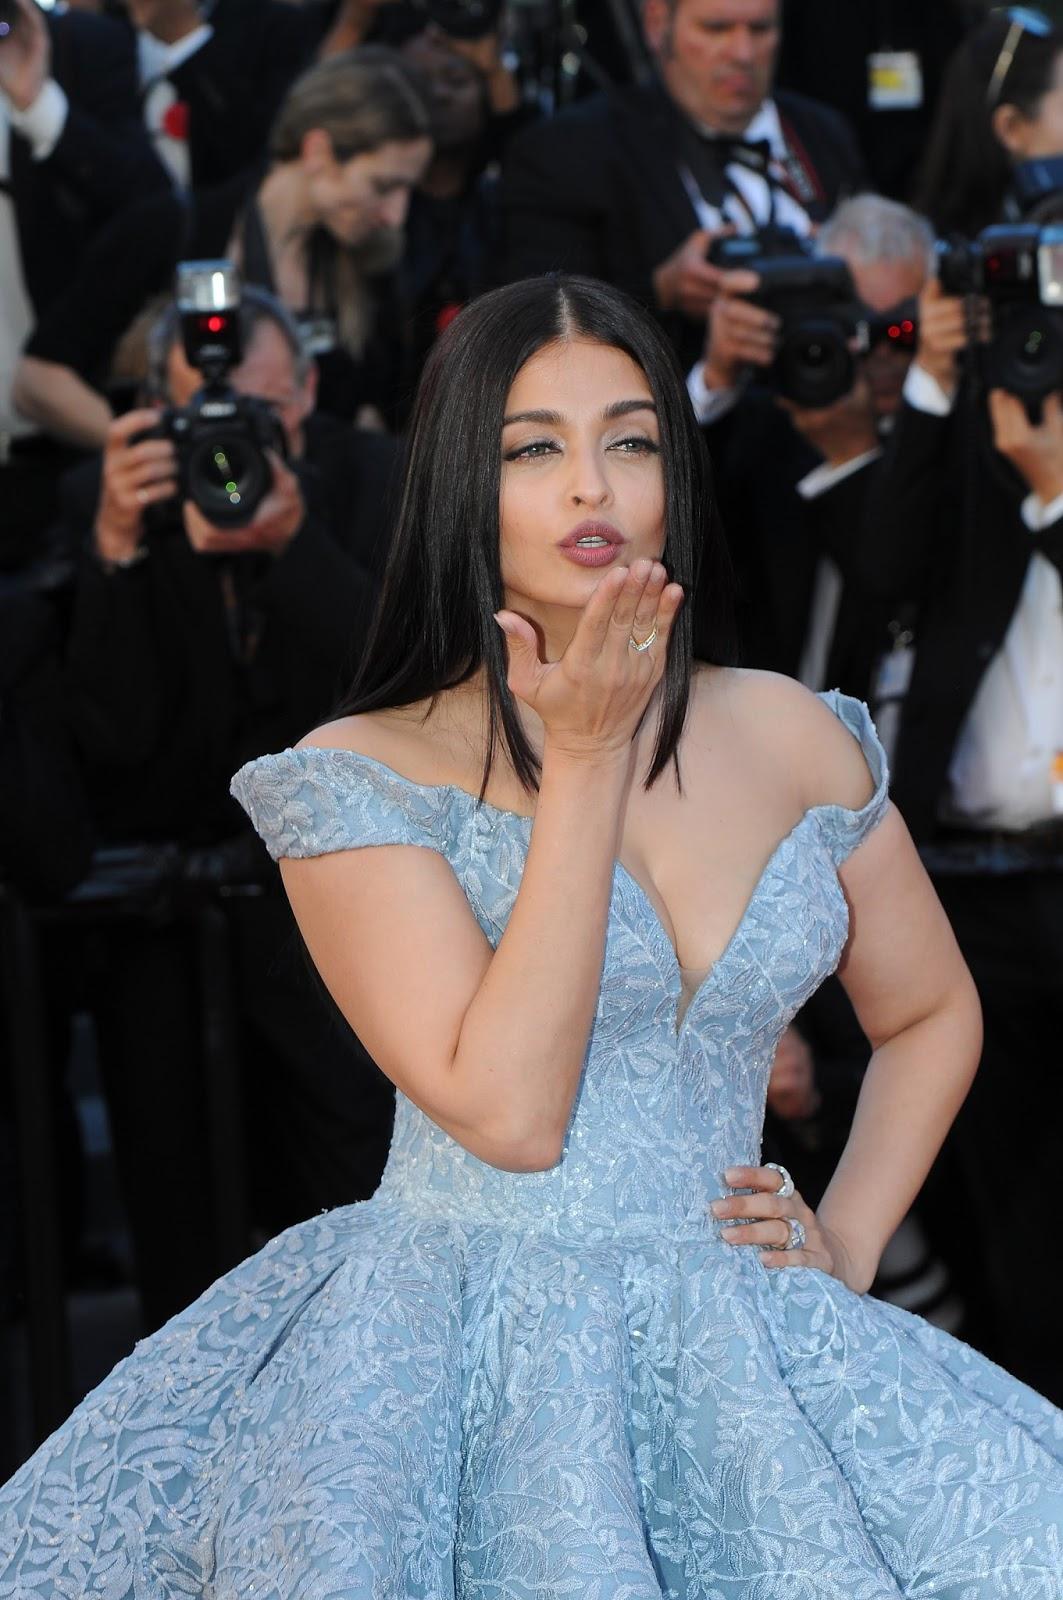 High Quality Bollywood Celebrity Pictures Aishwarya Rai -1531